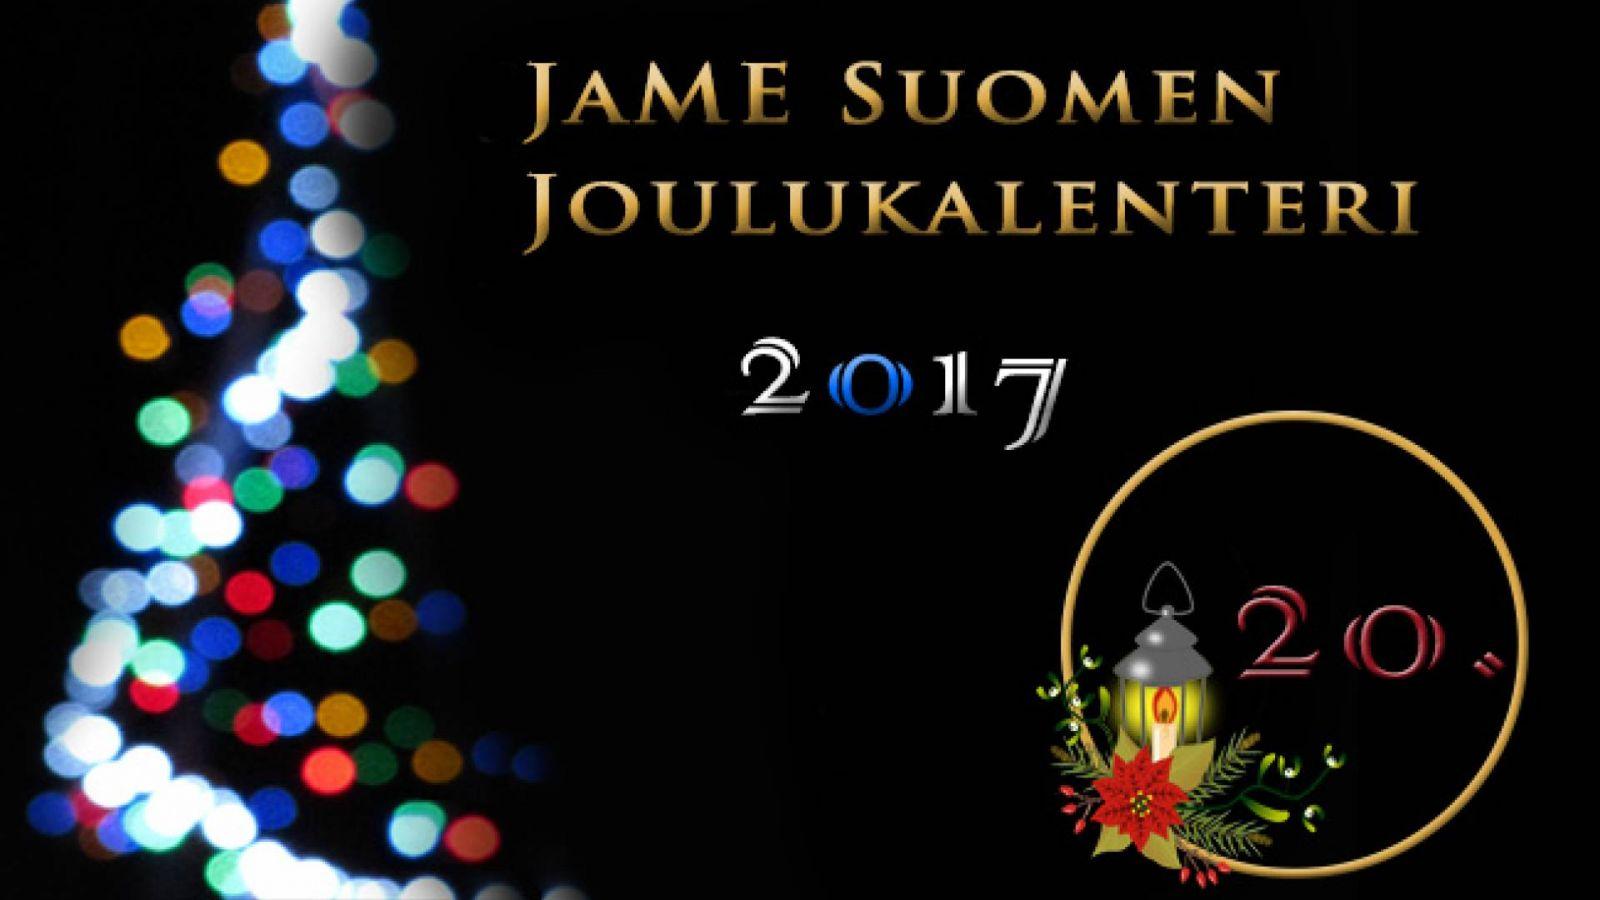 JaME Suomen joulukalenterin 20. luukku © Nipsu